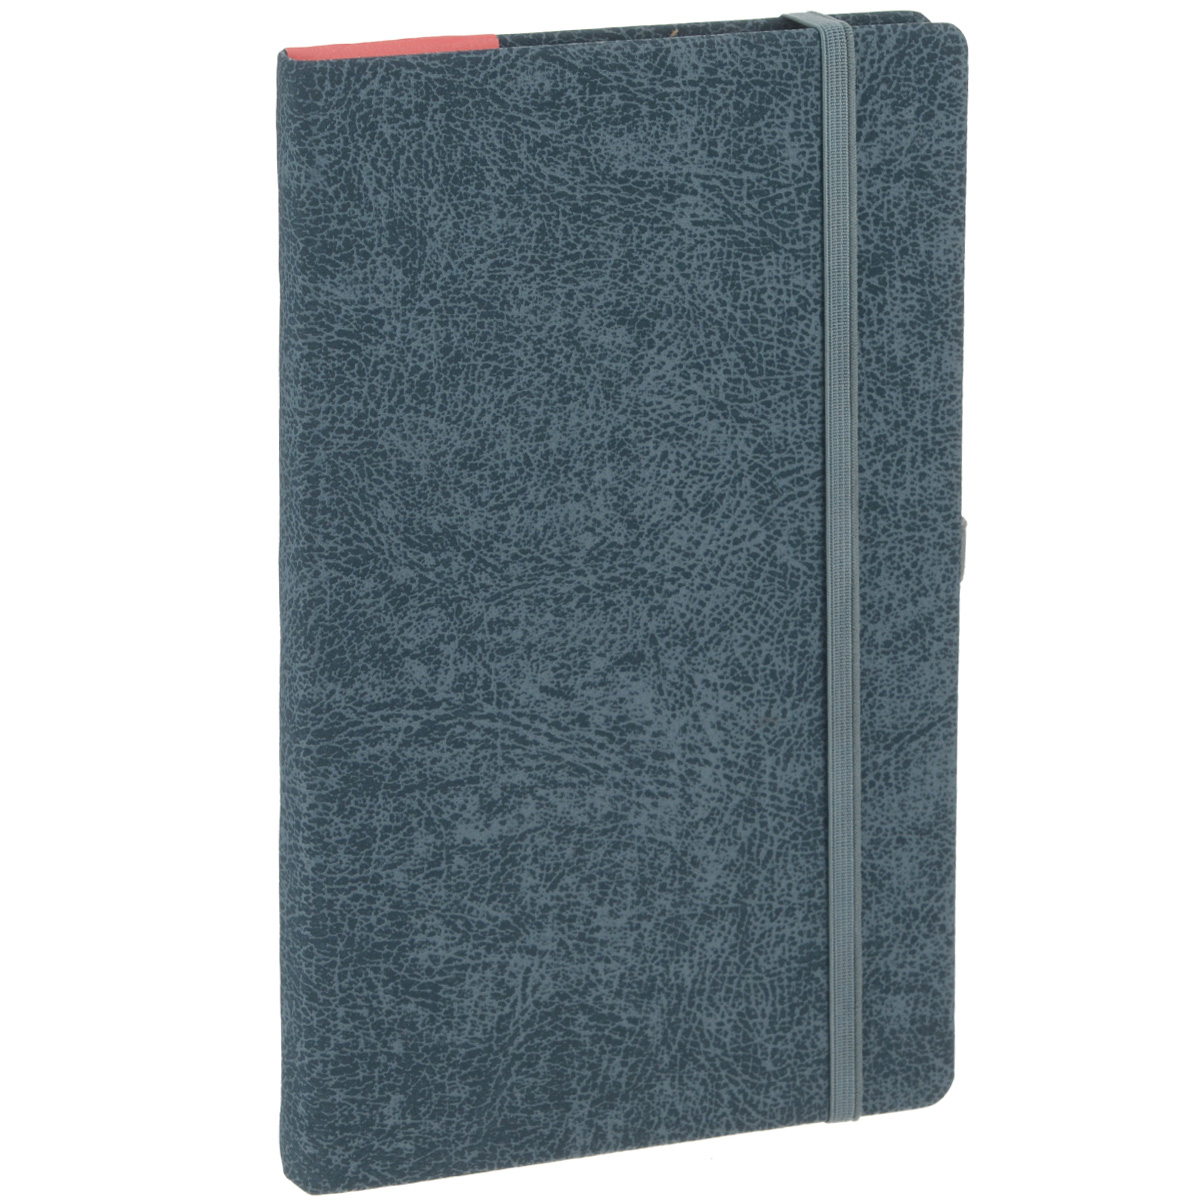 "Записная книжка Erich Krause ""Perfect"", цвет: серый, 96 листов"